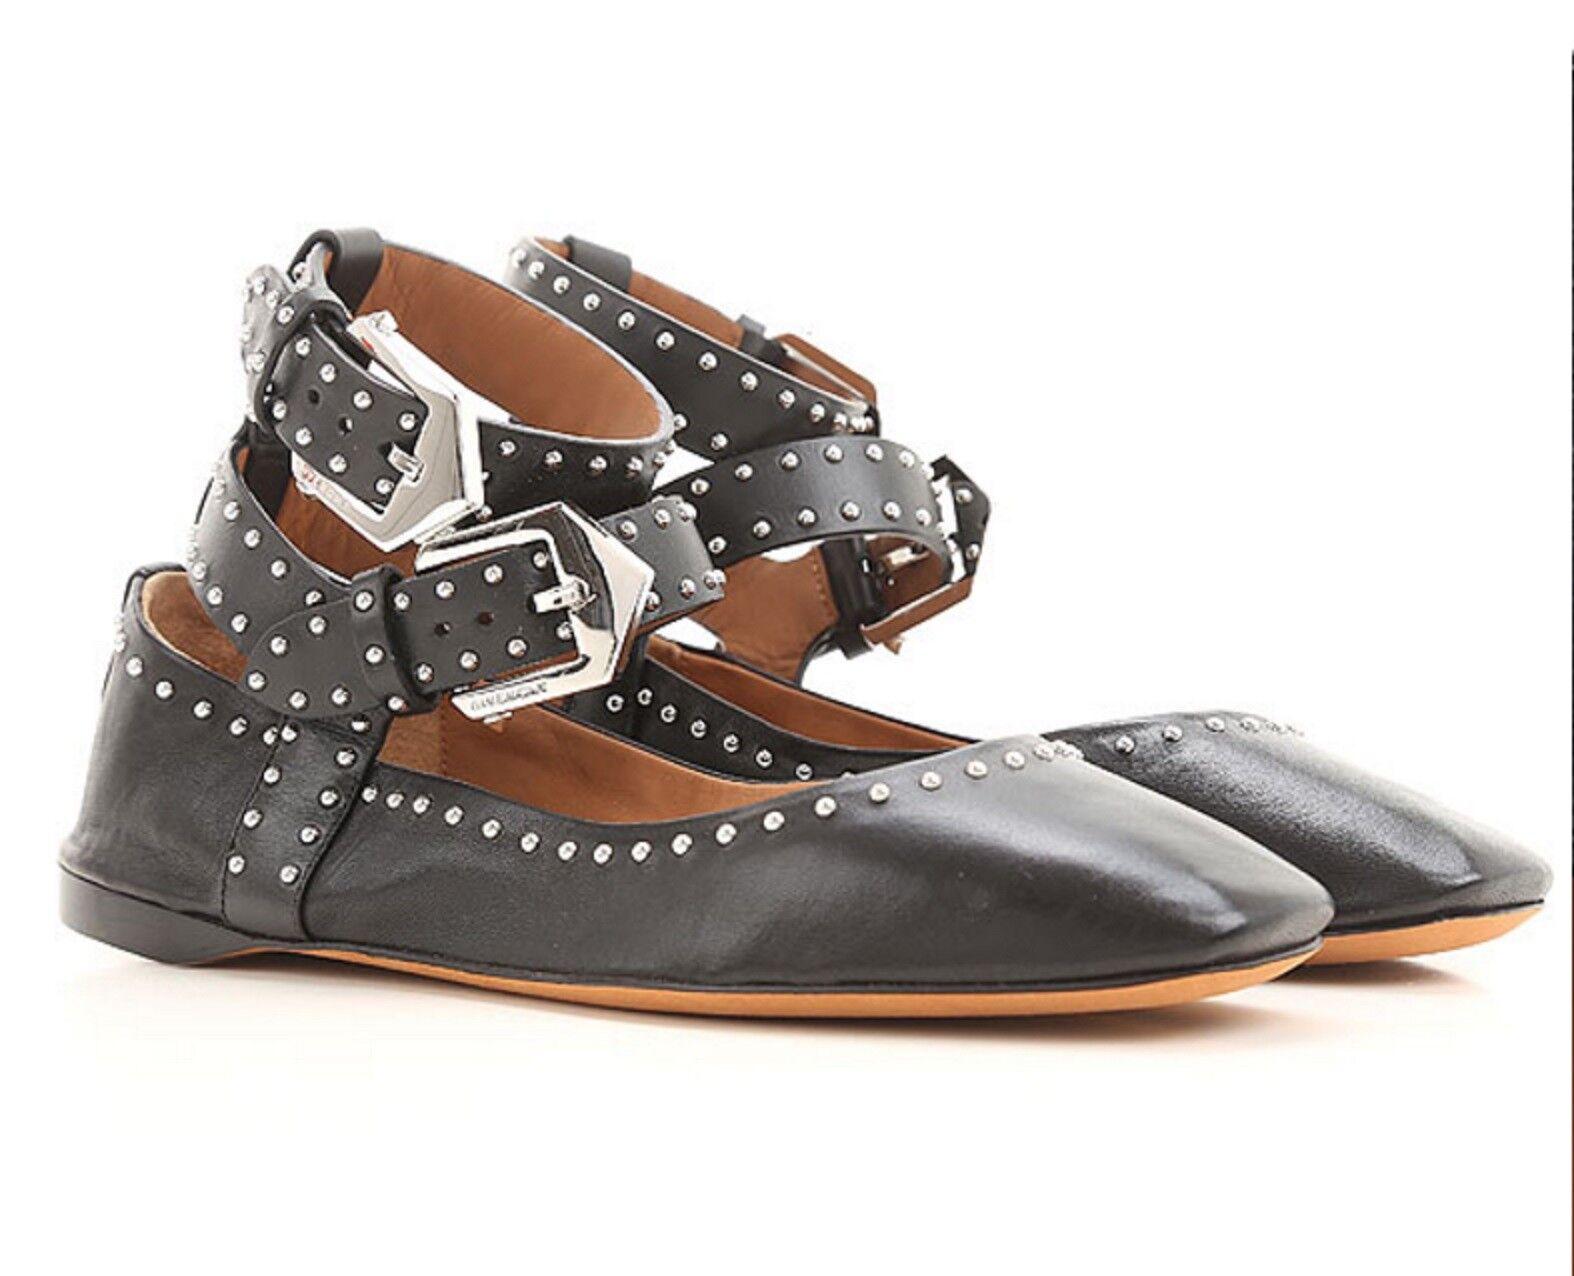 NWT Givenchy Leather Flats Elegant Soft Dual-Wrapped Dual-Wrapped Dual-Wrapped Lined Studded 36.5 51cdee